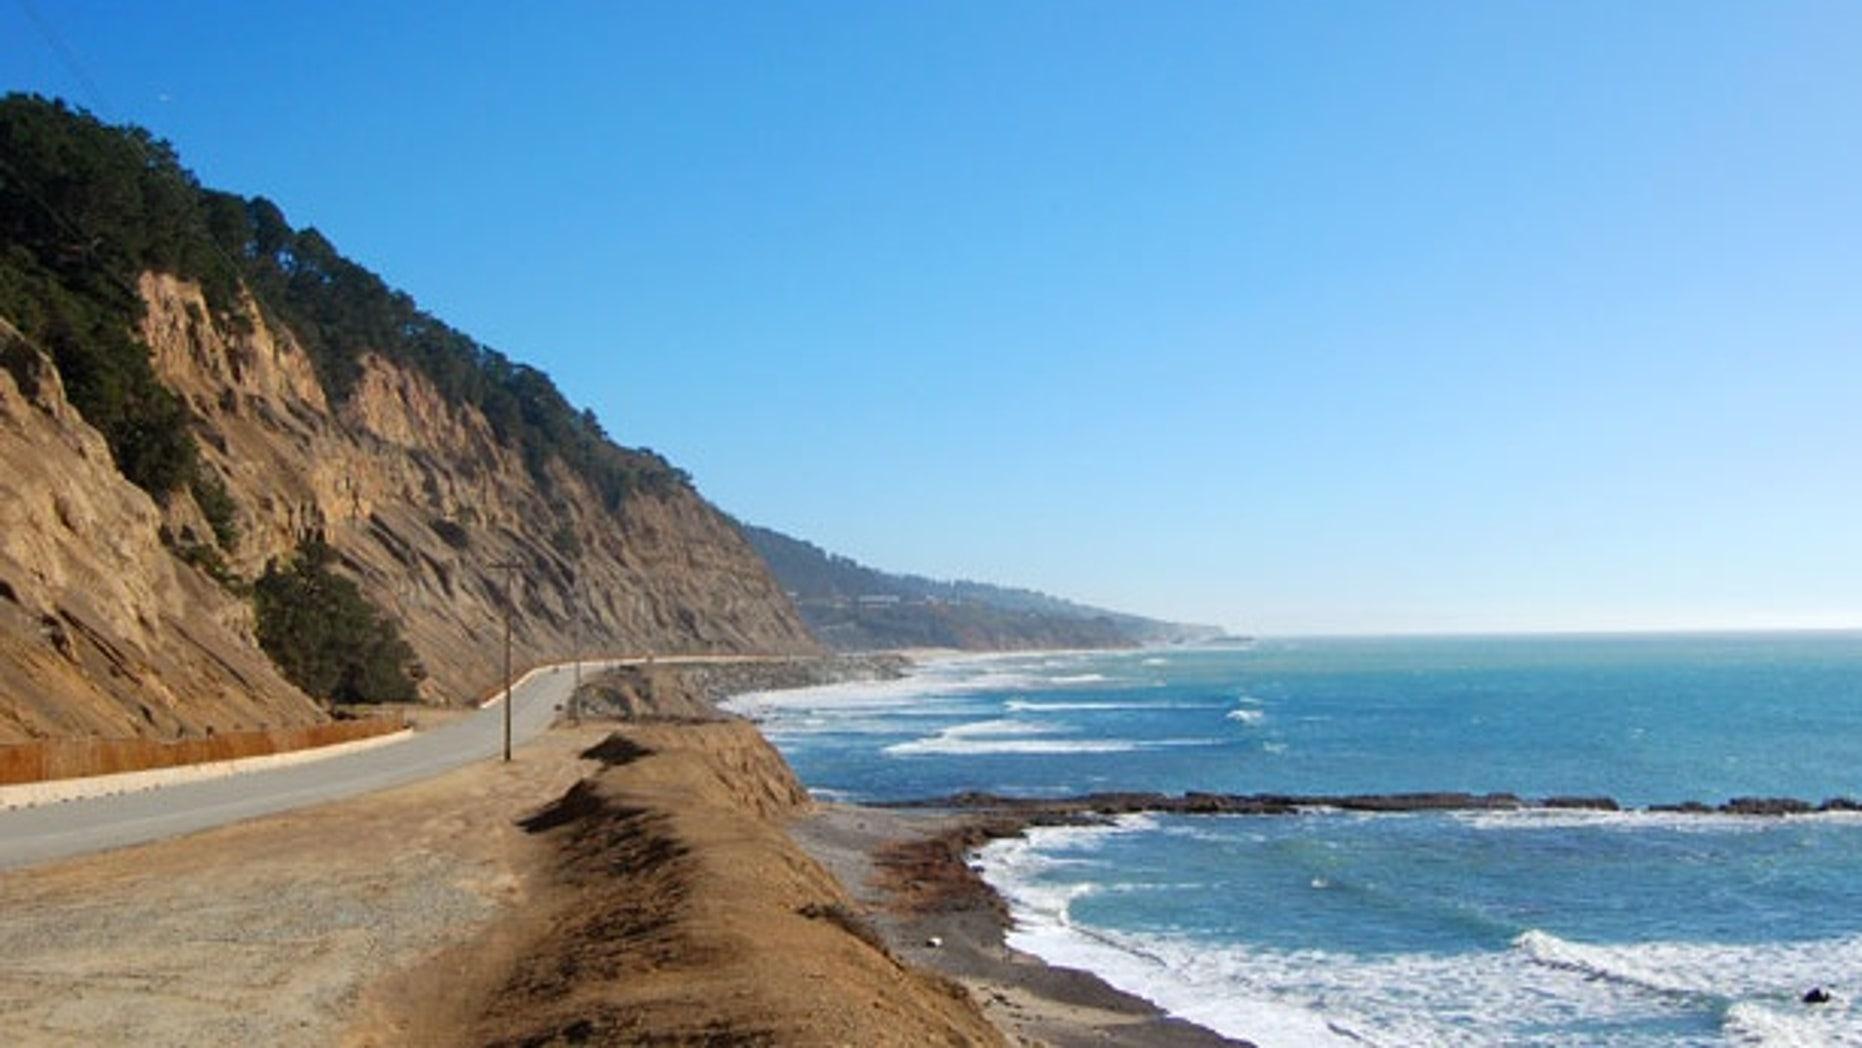 California's Pacific Highway 1 runs 135 miles between San Luis Obispo and Monterey.